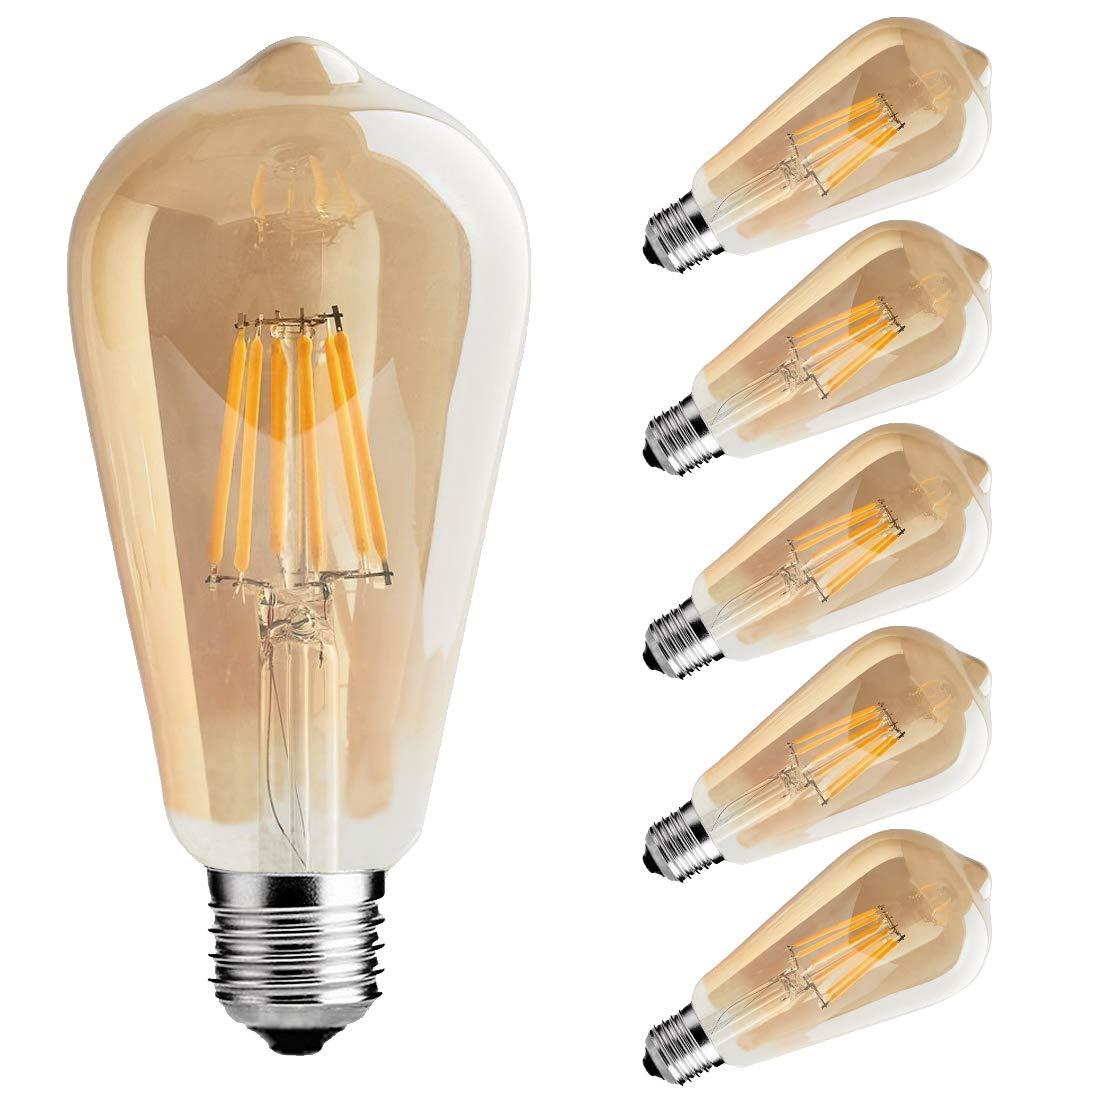 e26 Medium Screw Base,10 Pack Antique Style Amber ST64 LED Edison Bulbs 4W Vintage LED Filament Light Bulb,Dimmable LED Light Bulb Amber Glass Cover,2700K